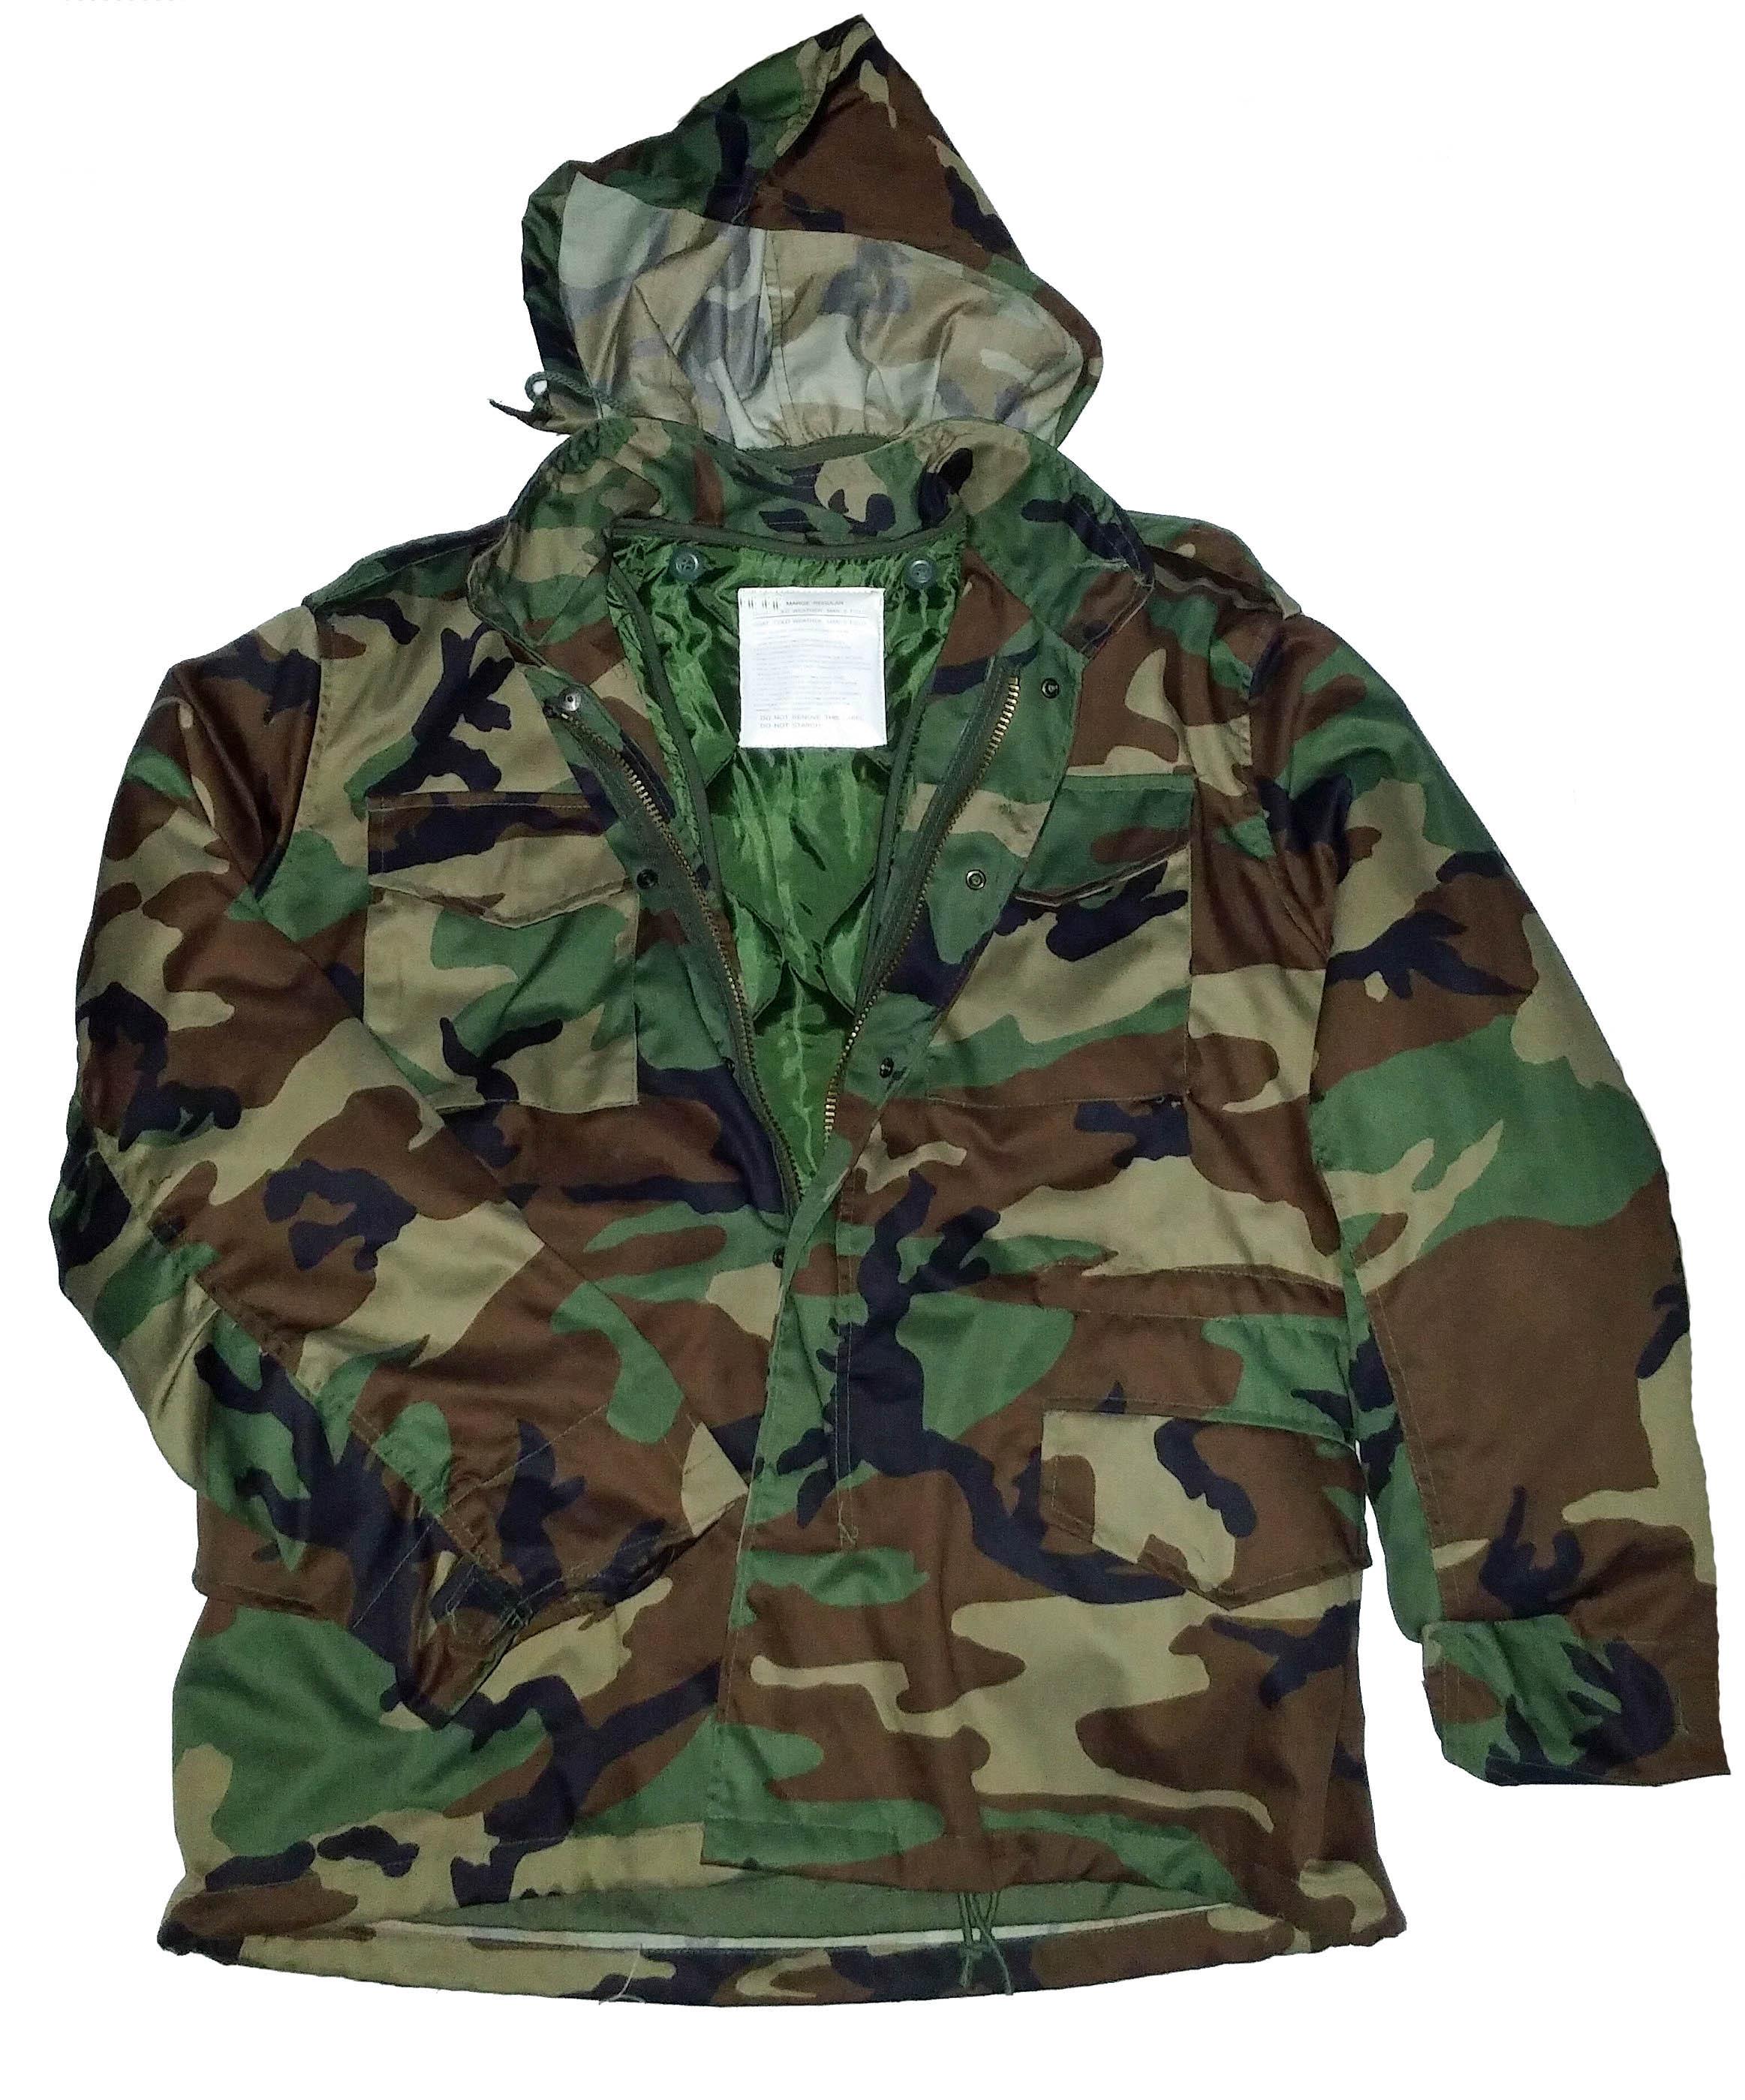 Manteau M-65 camouflage